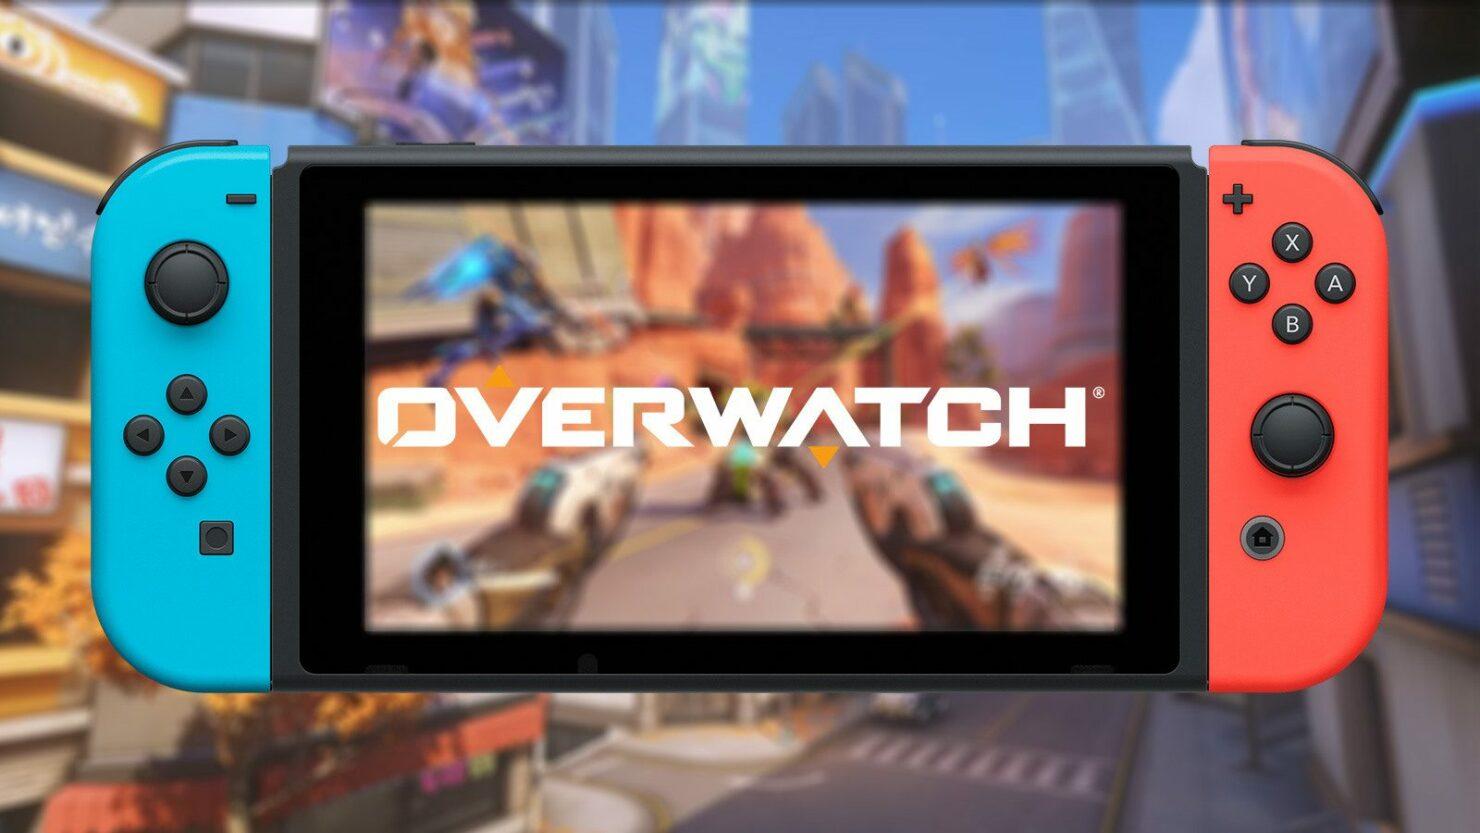 Nintendo Switch Overwatch Launch Event